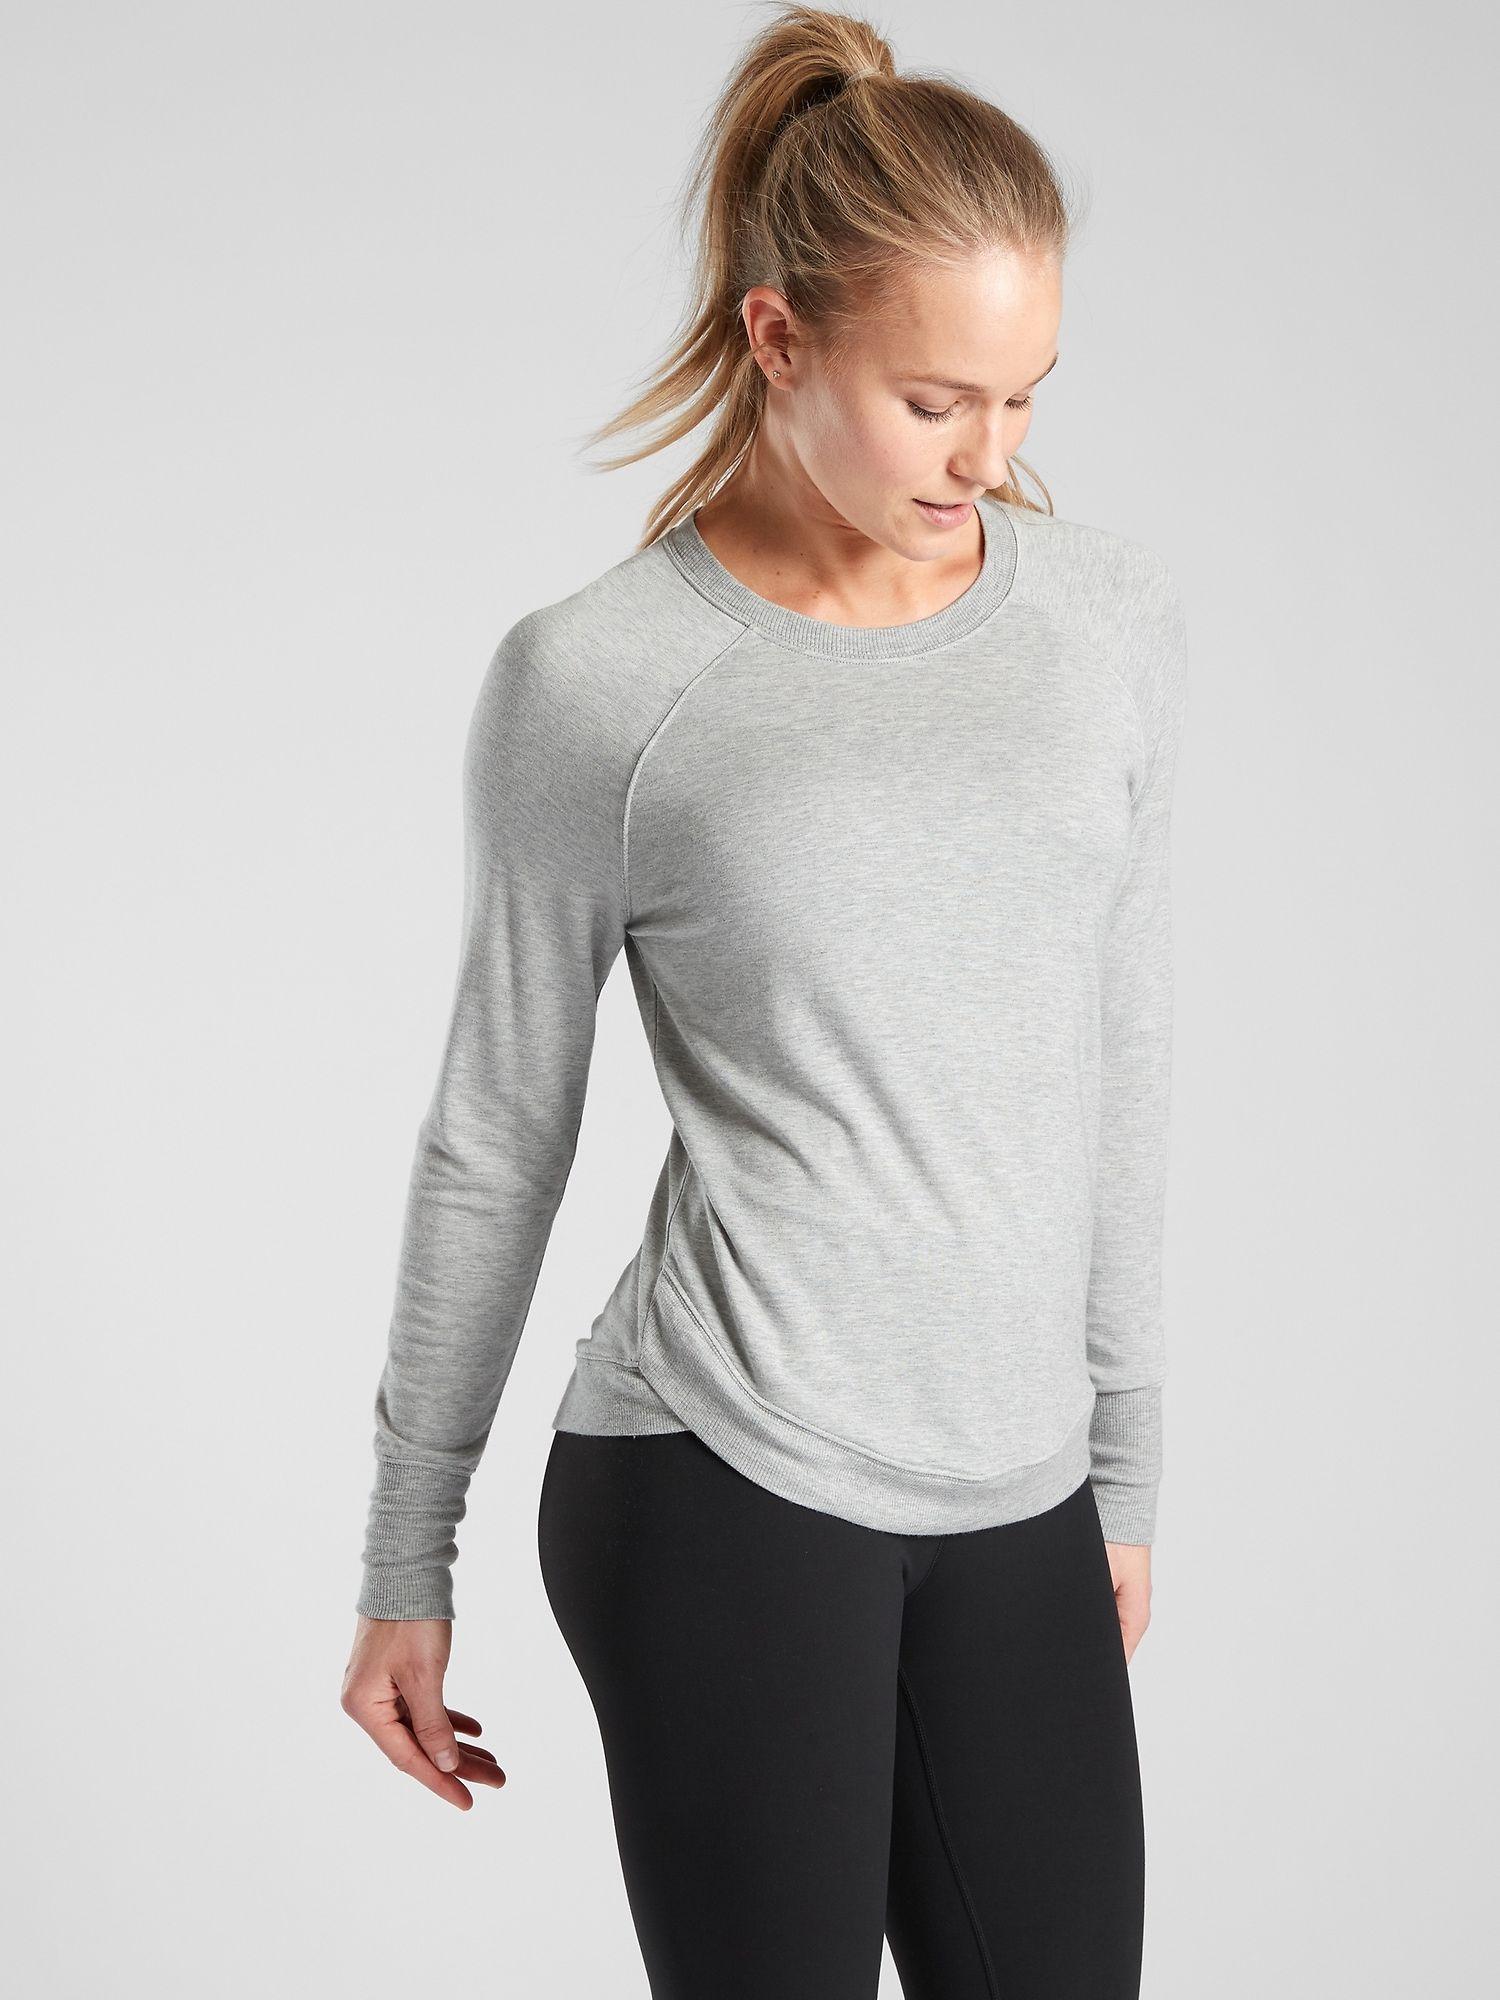 Mindset Sweatshirt Athleta Sweatshirts Workout Tops For Women Sweatshirts Women [ 2000 x 1500 Pixel ]